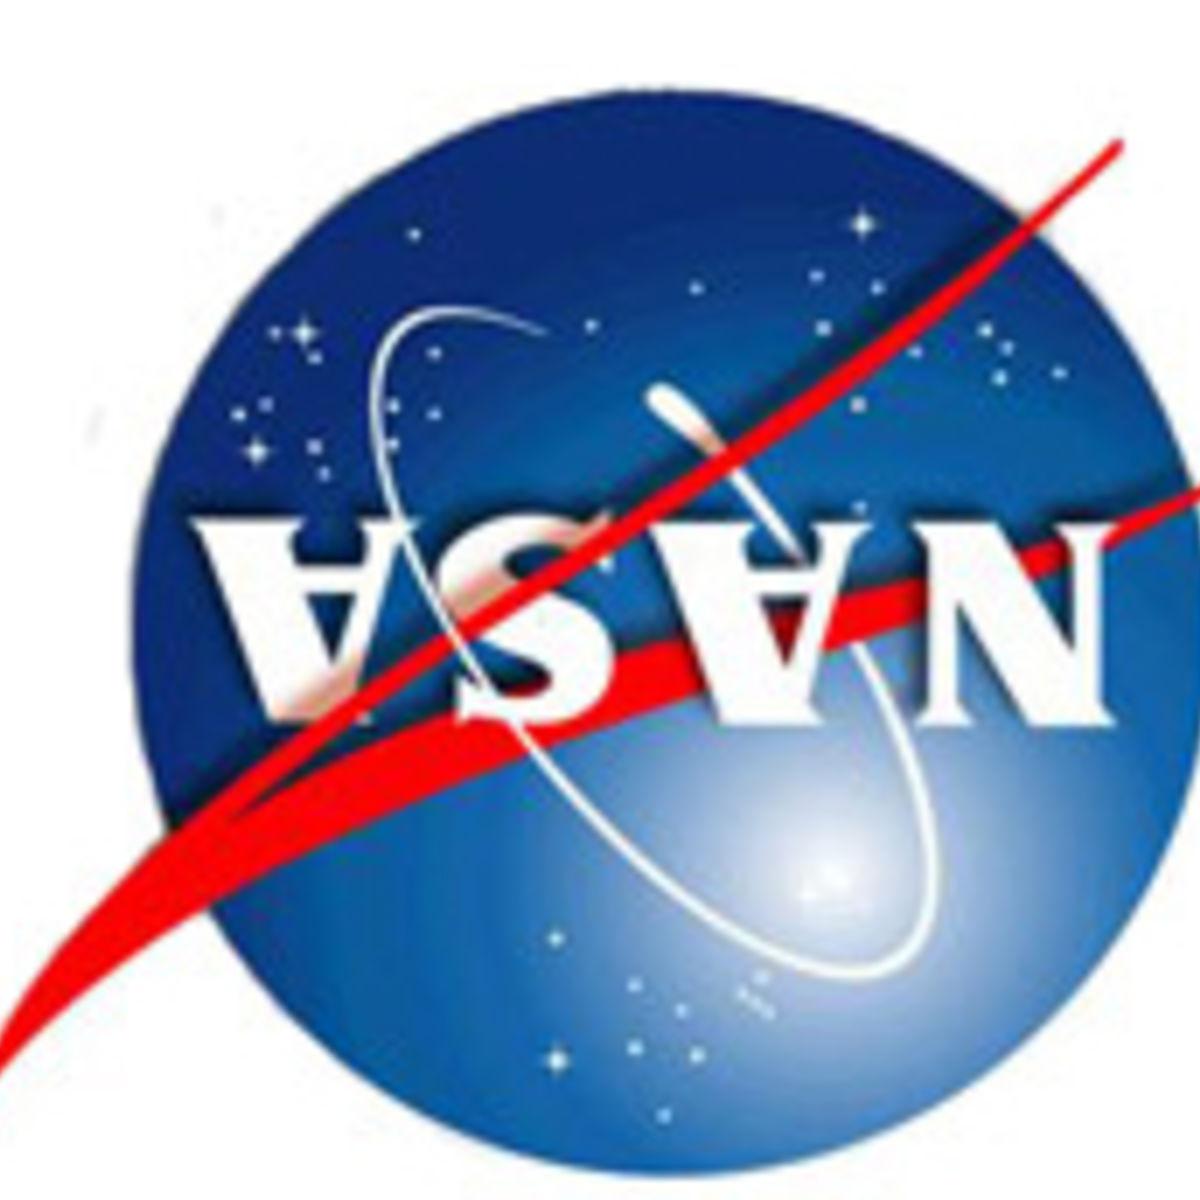 NASA_logo_upsidedown_4.jpg